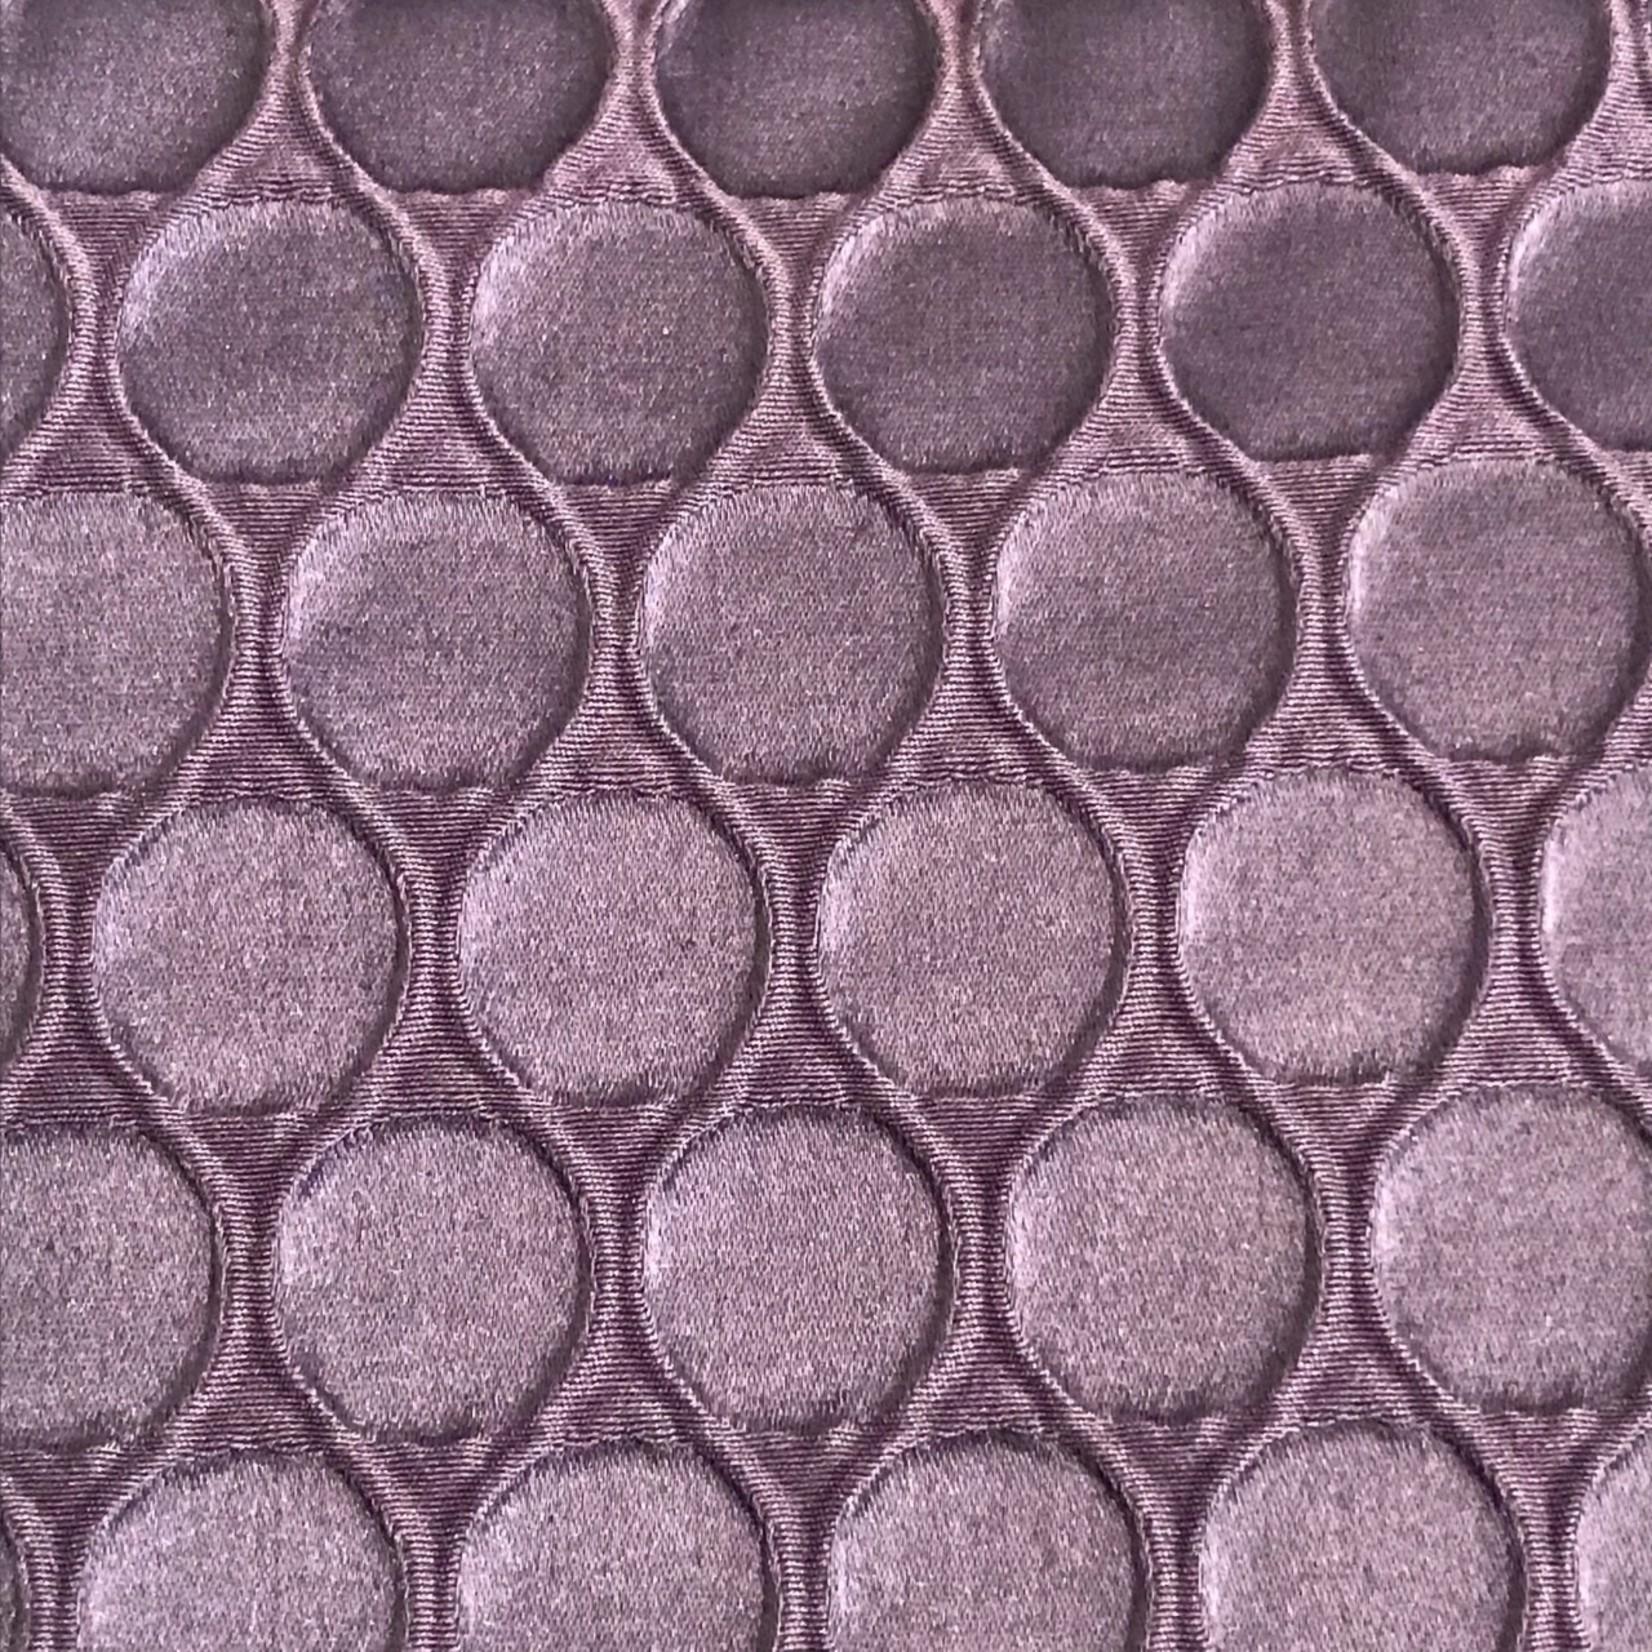 Himatsingka Himatsingka Pouch- Extra Large- Grape Shimmer